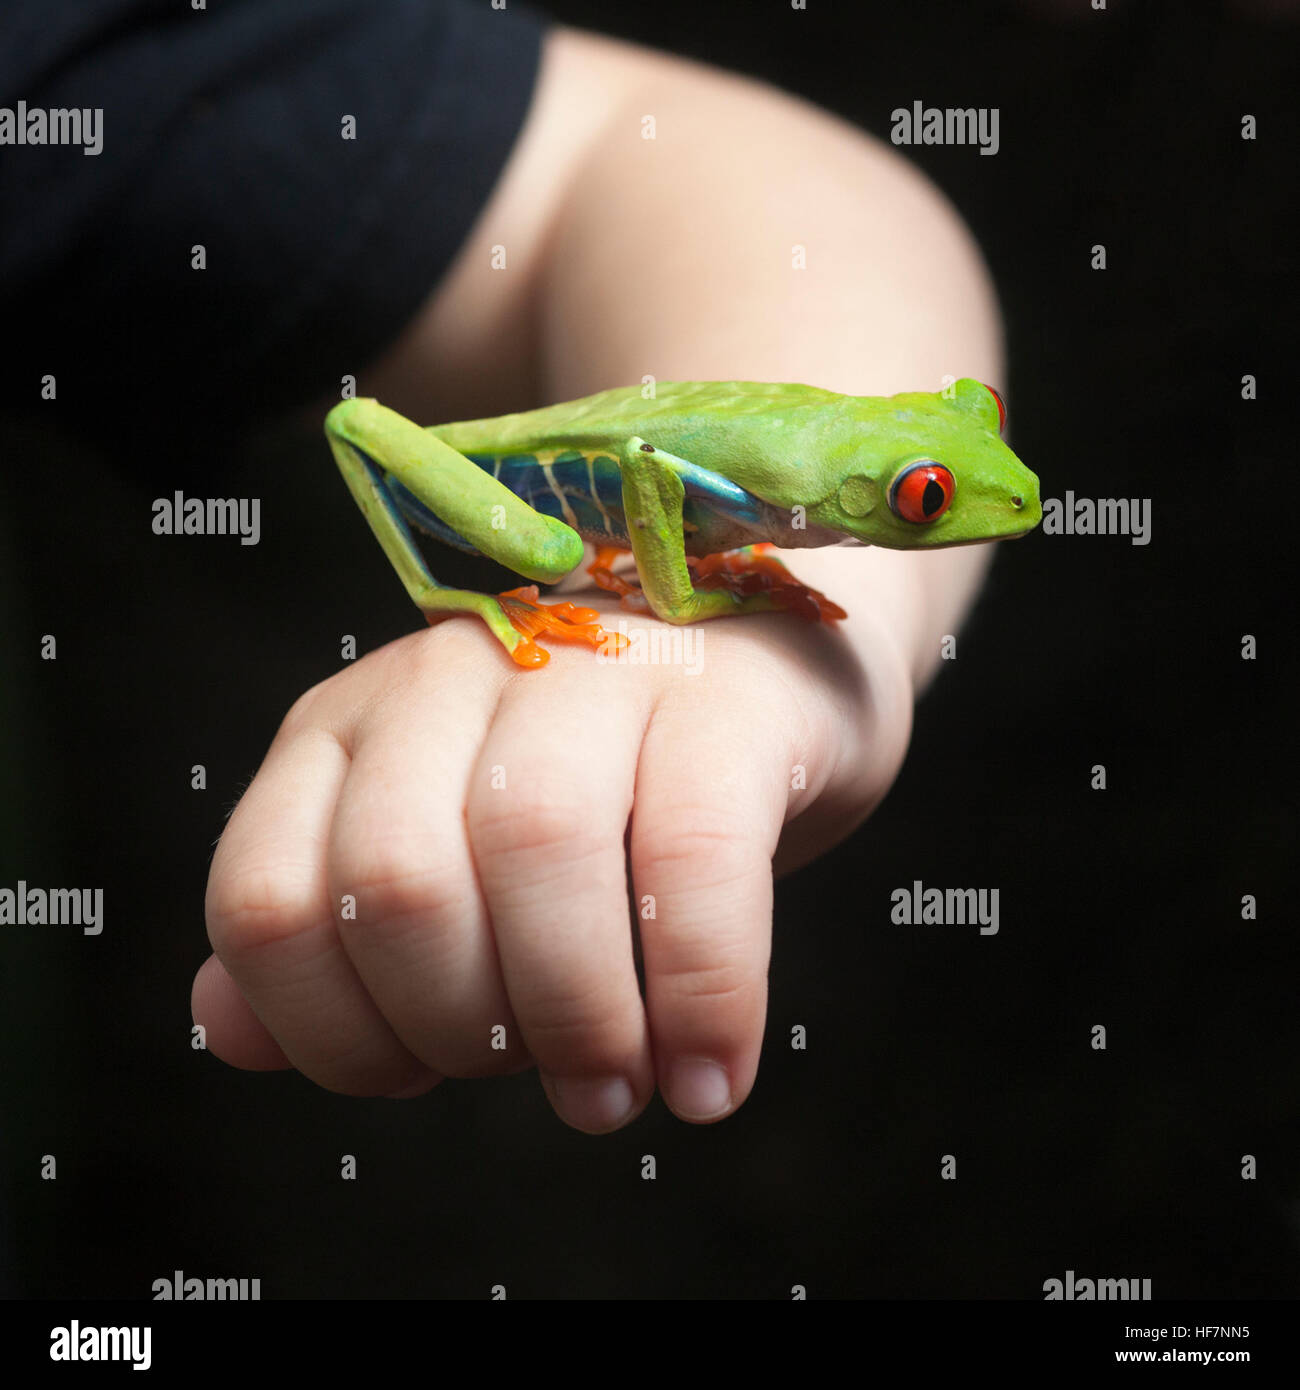 Red-eyed Tree frog (Agalychnis callidryas) on boy's hand Stock Photo